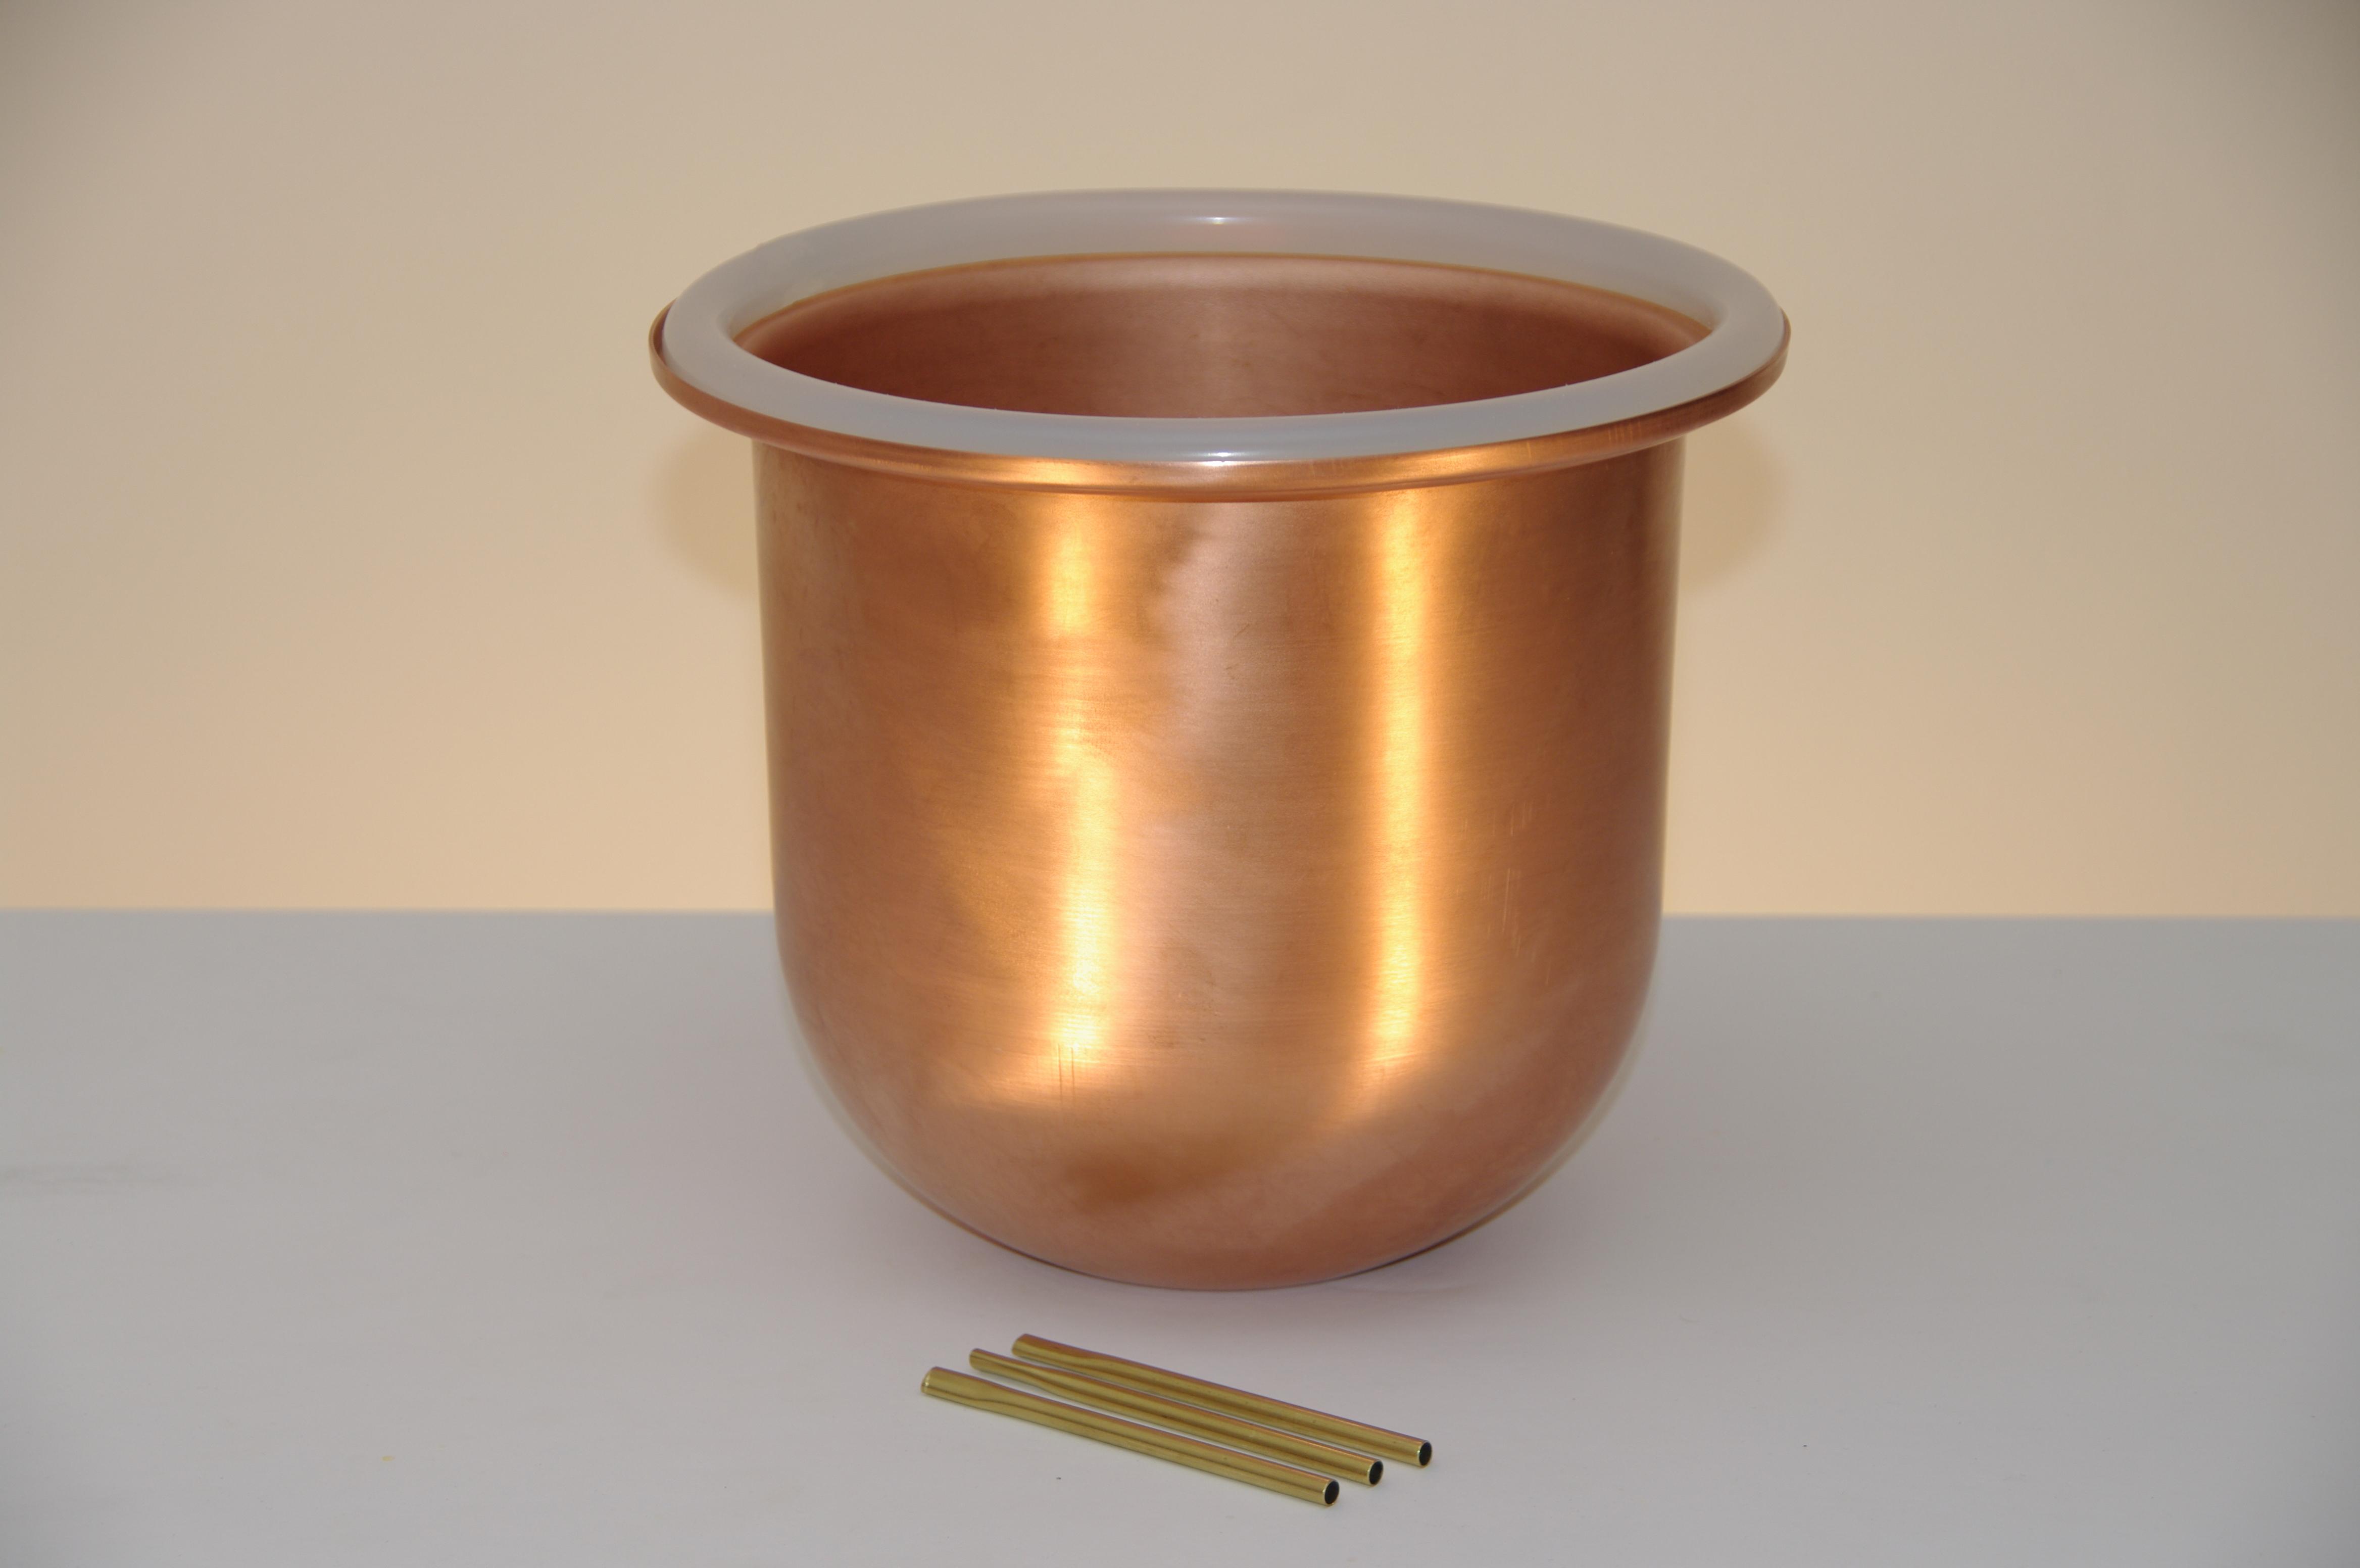 Kessel DELUXE, 7,8 Liter